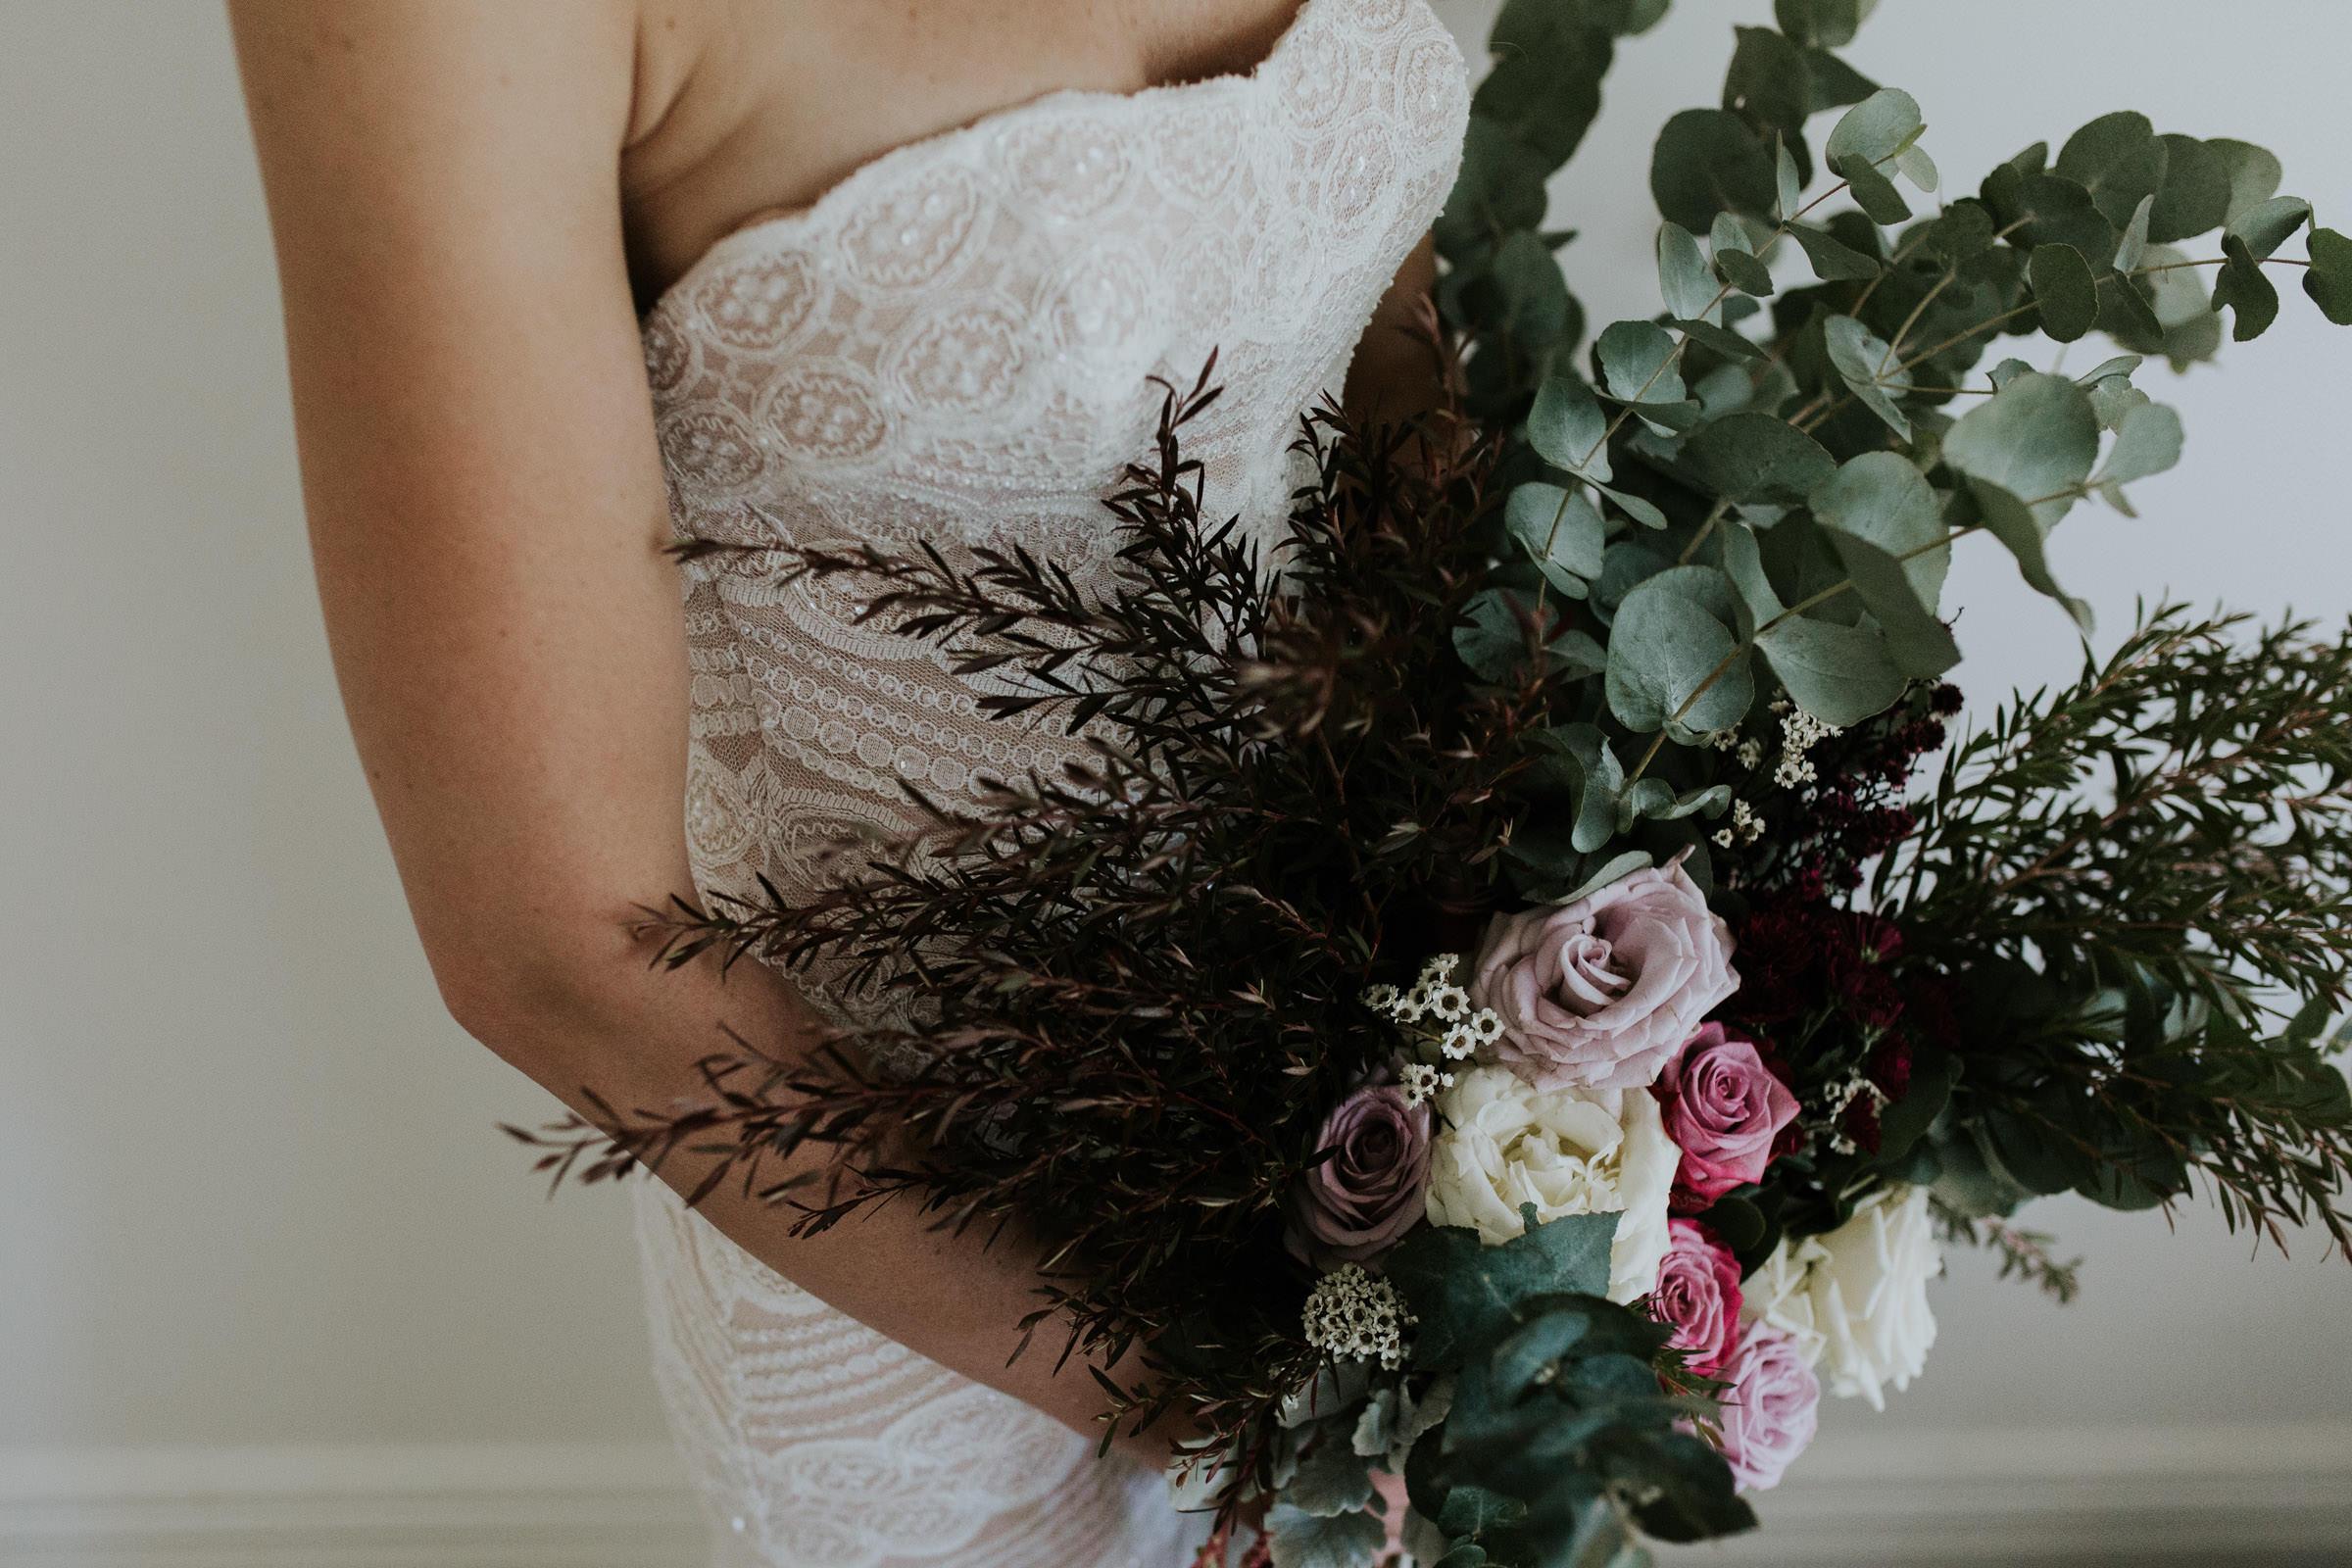 Emma+John+Far+South+Coast+Wedding+Festivl+Glamping+Bush-59.jpg